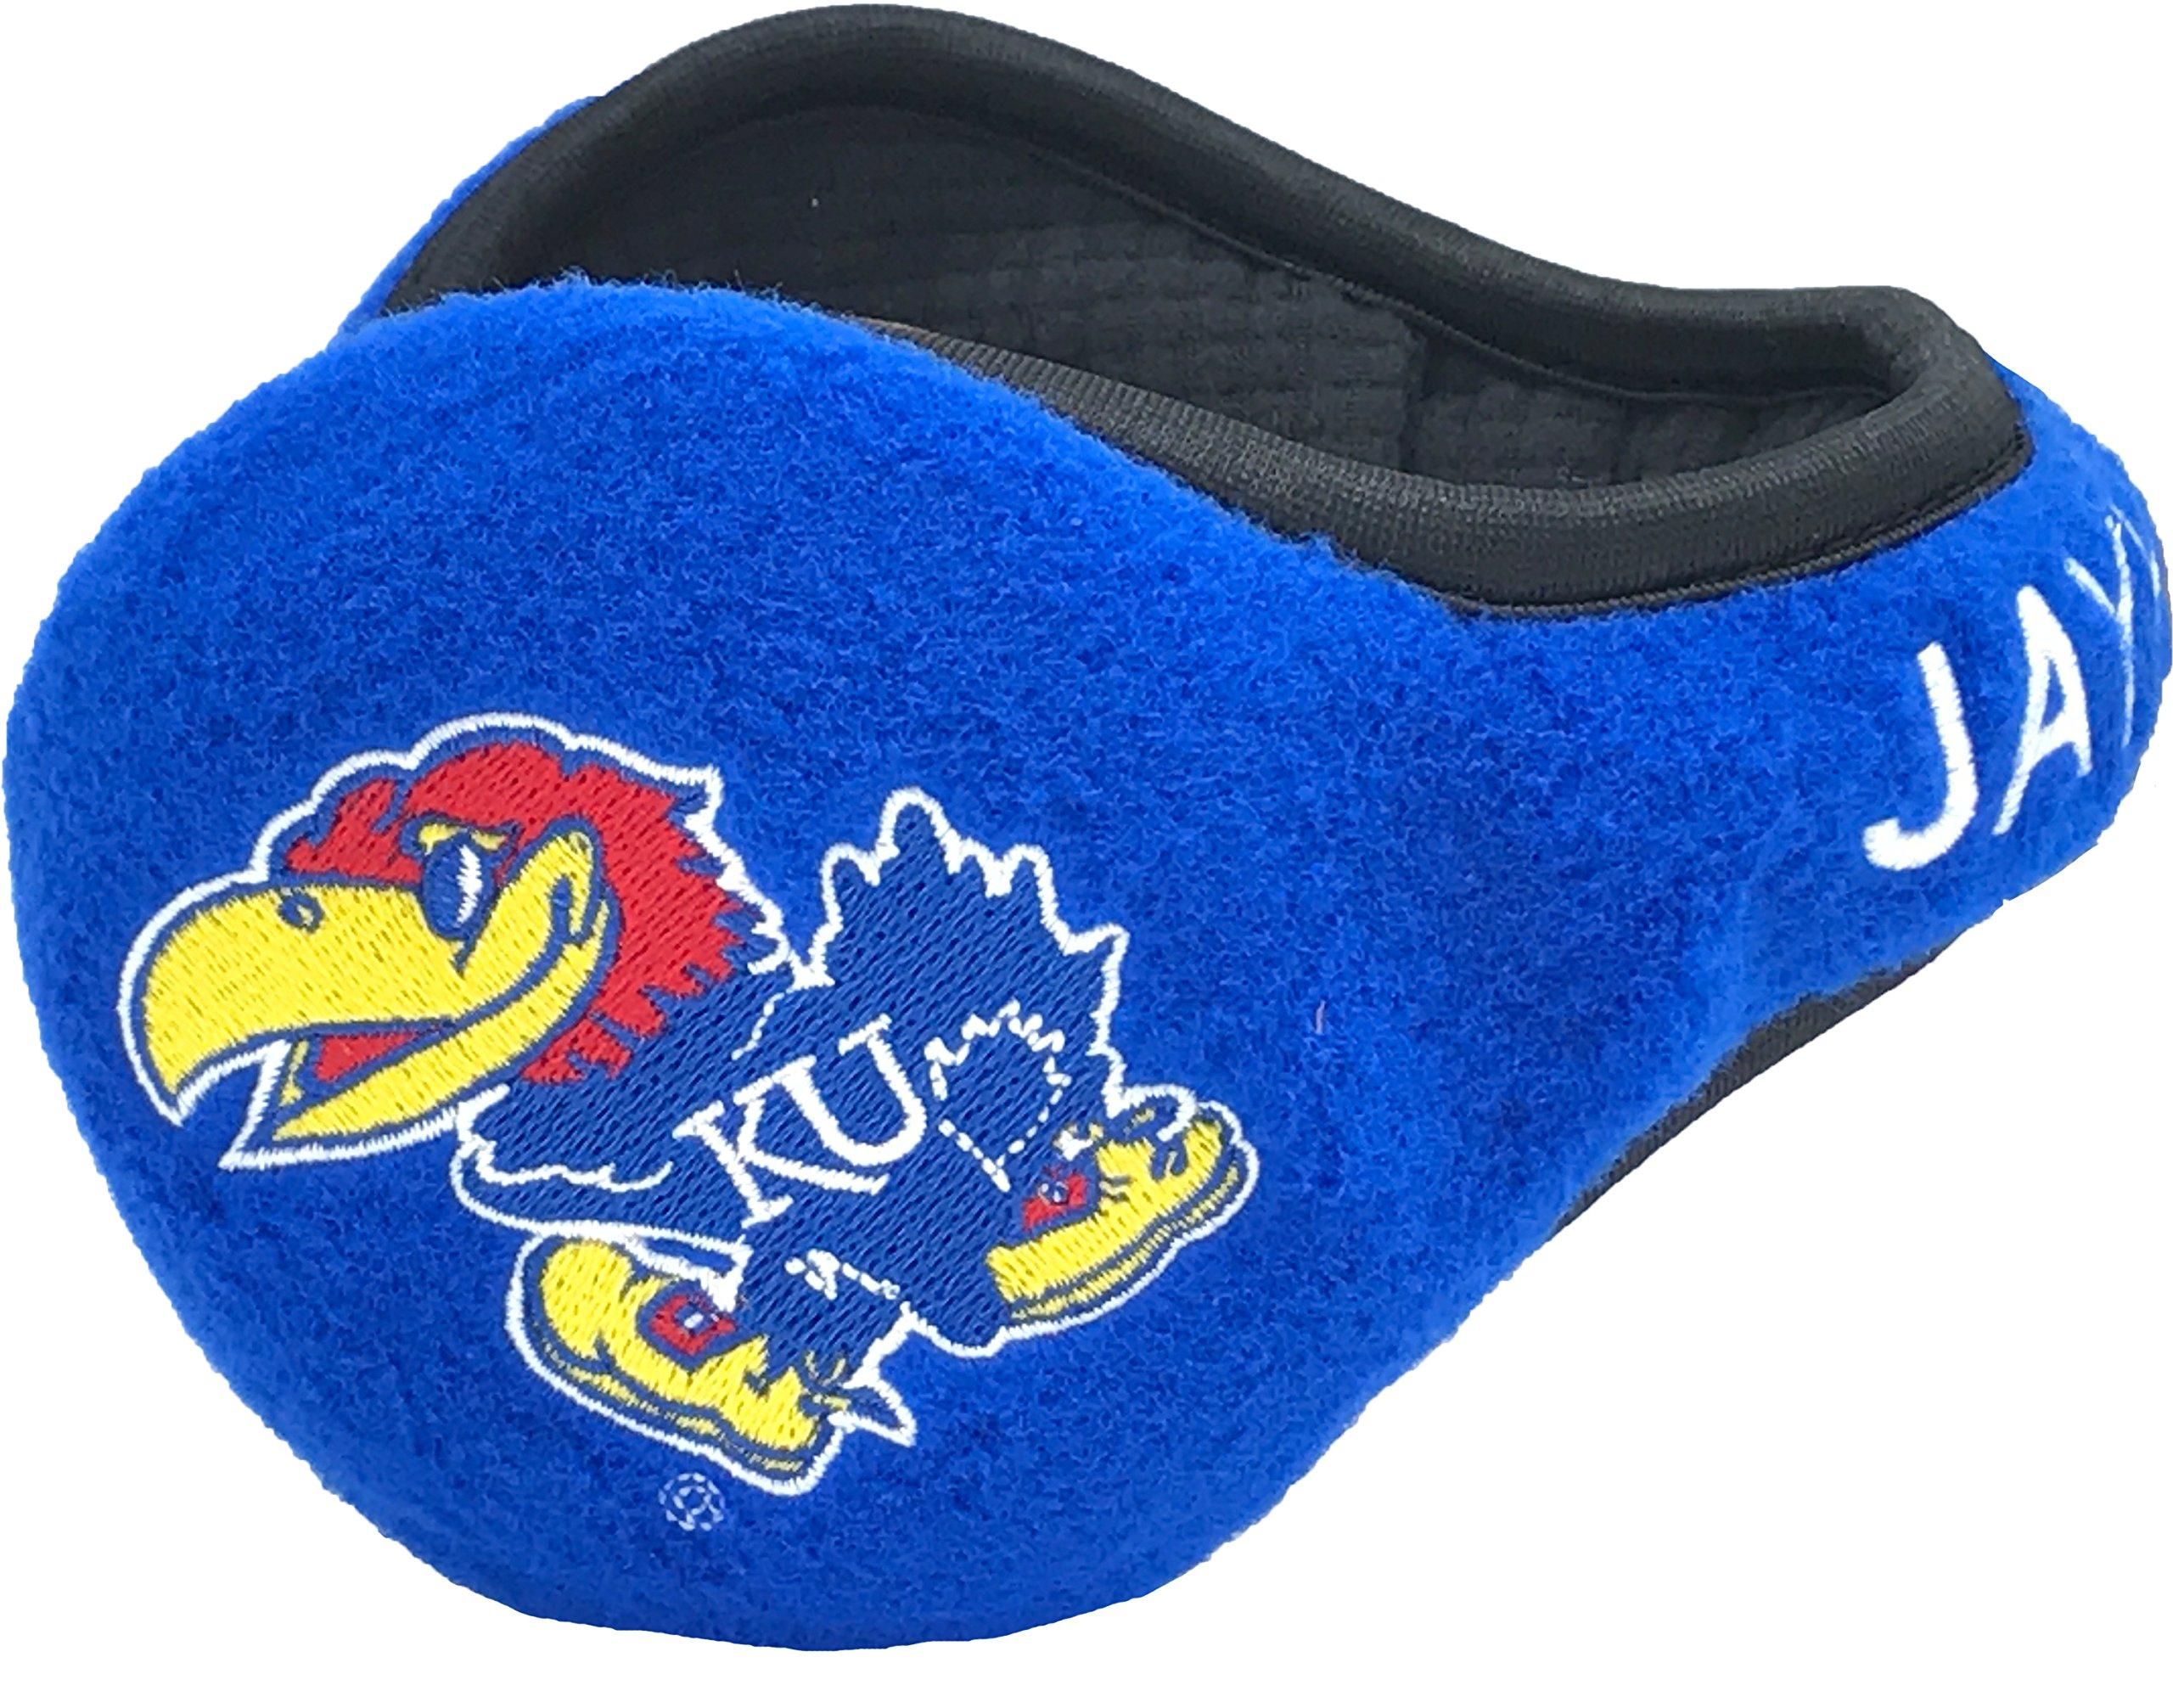 180s Kansas Jayhawks Behind-the-Head Ear Warmer, Unisex, One Size Fits Most, Blue